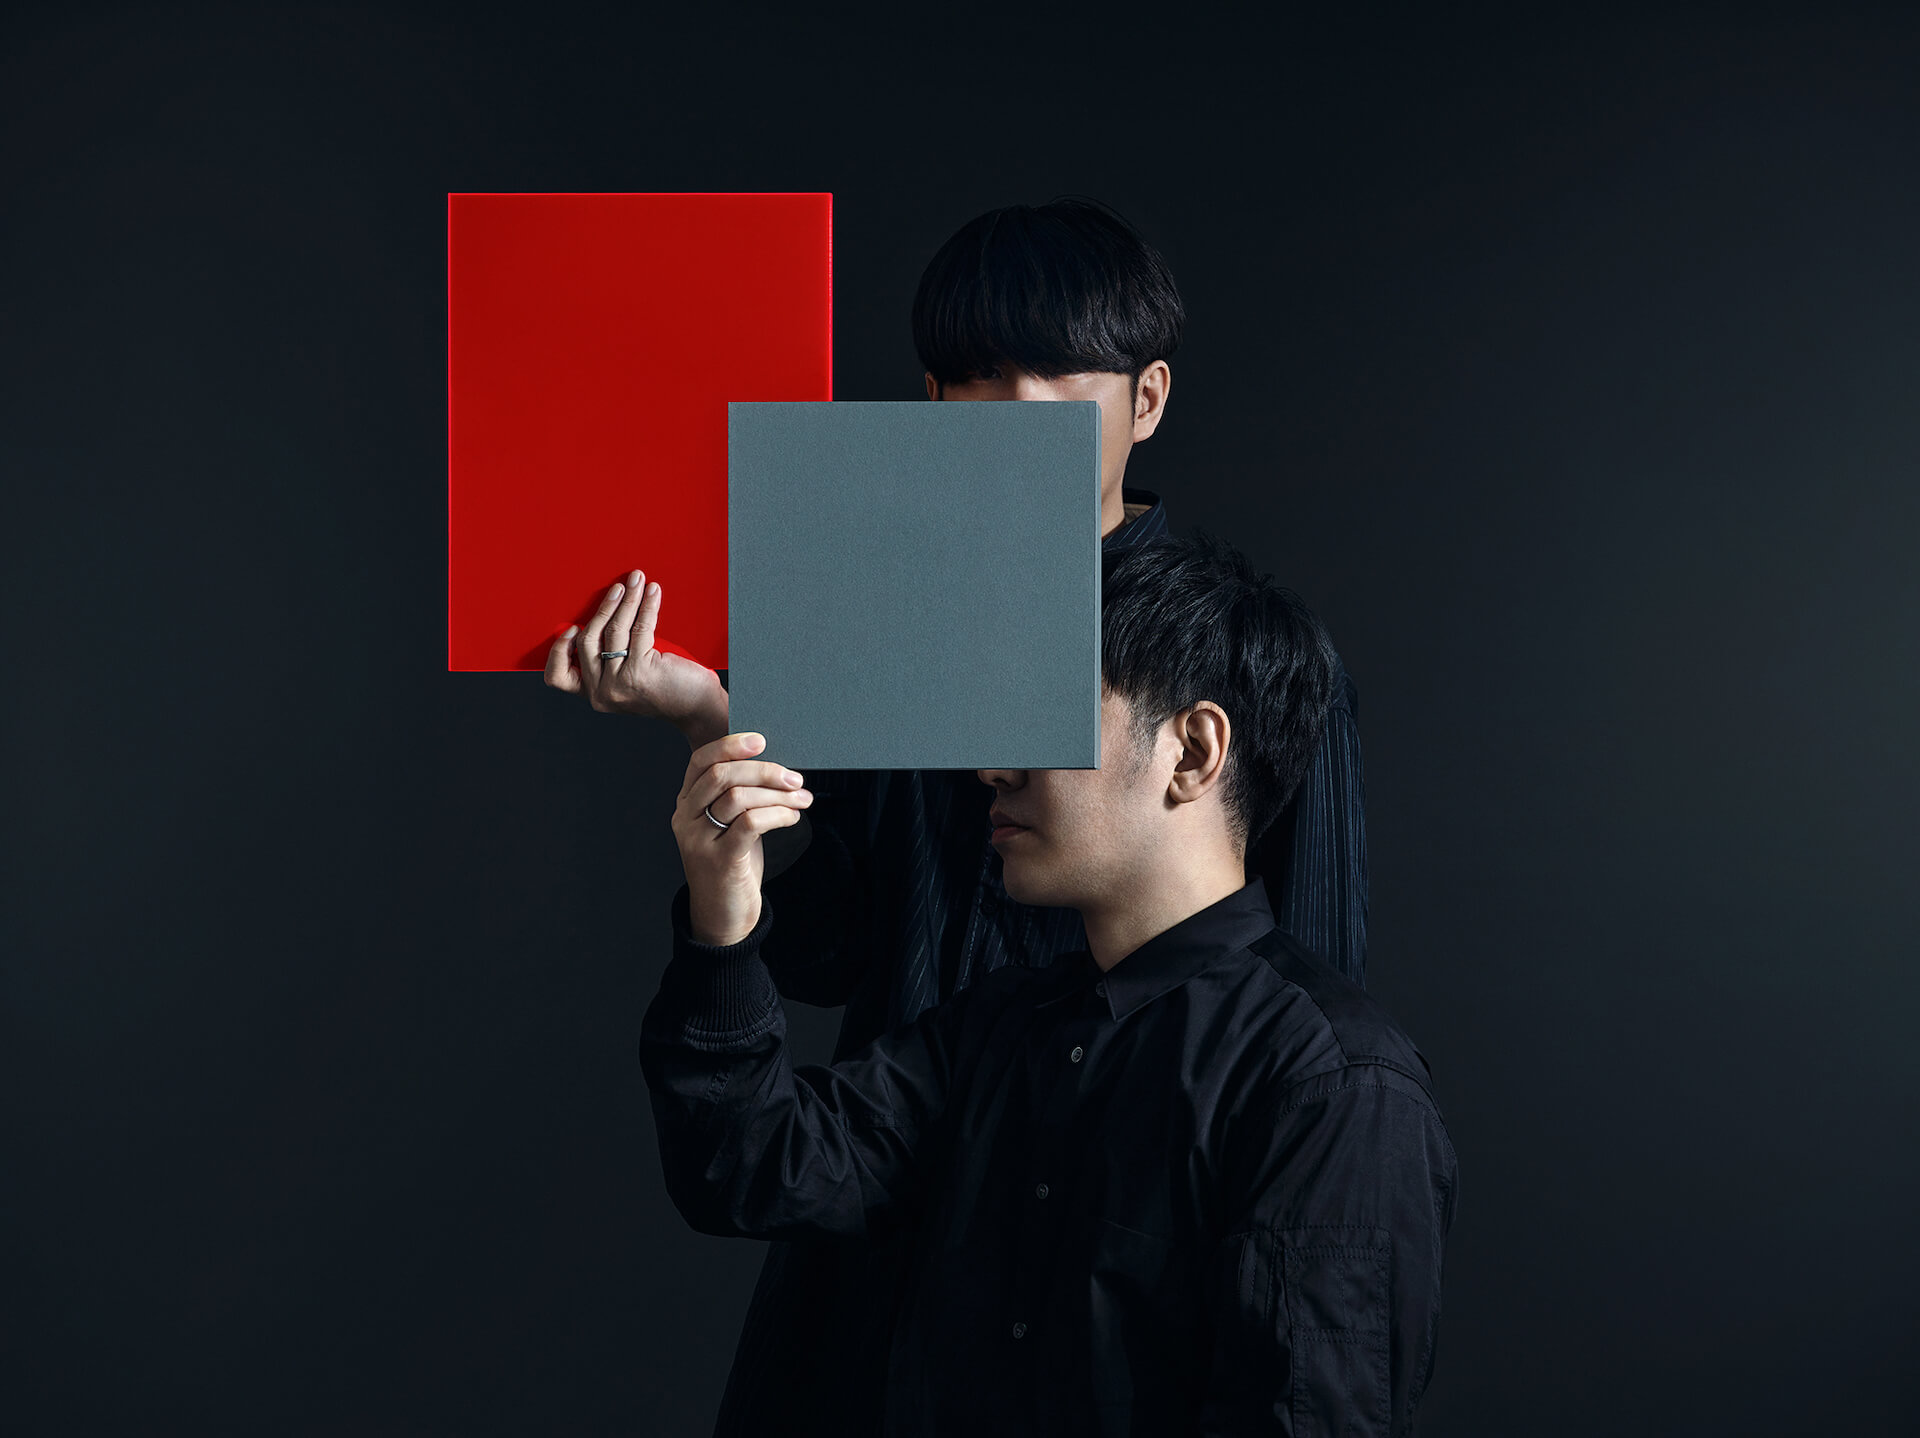 "80KIDZとmabanuaのコラボ楽曲""Glasses""をShin Sakiuraがリミックス!7インチレコードのB面にも収録決定 music210408_80kidz-210408_2"